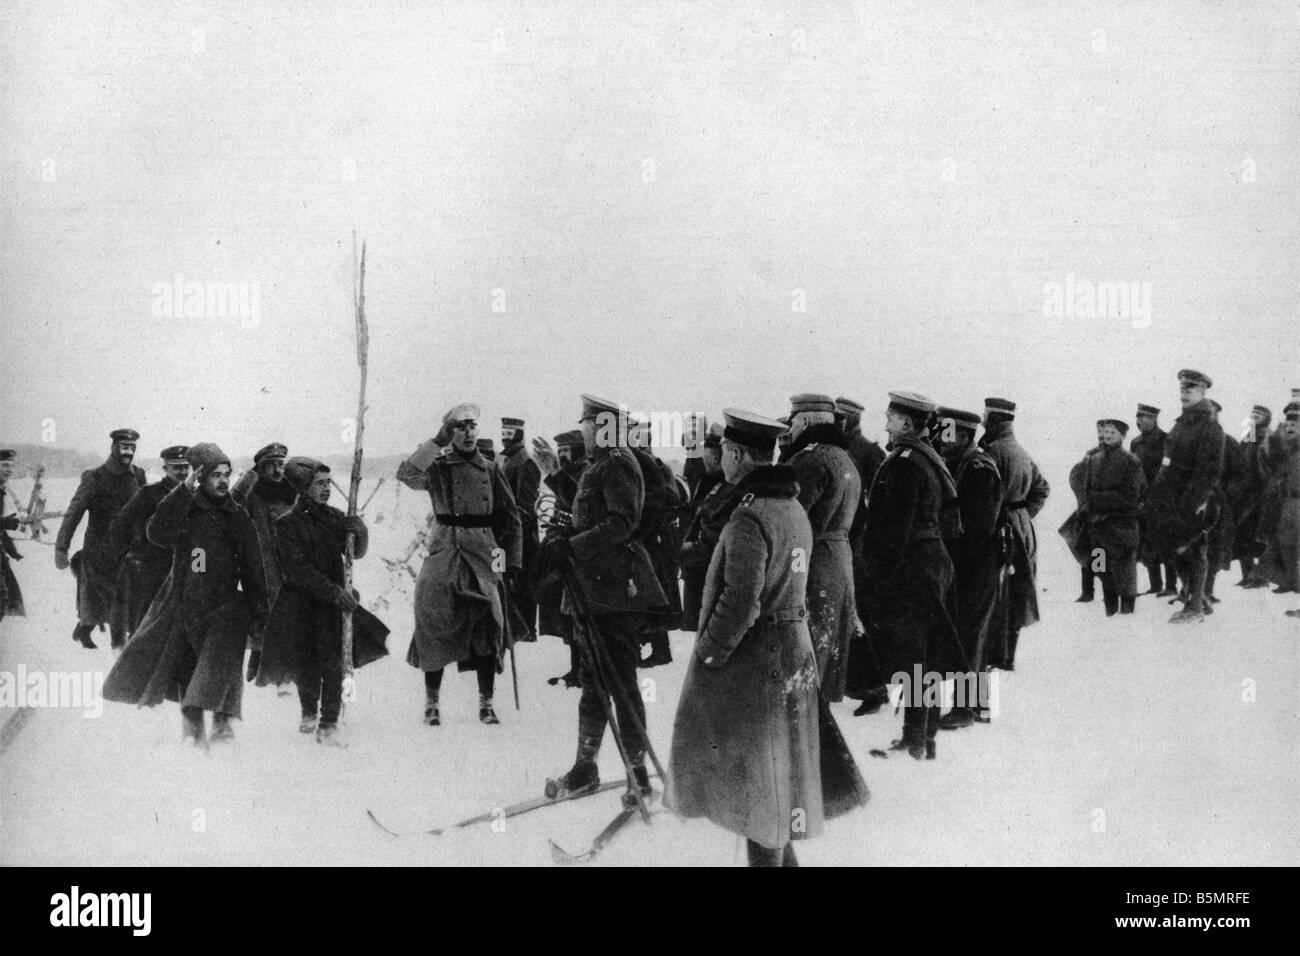 Truce World War Stock Photos & Truce World War Stock Images - Alamy